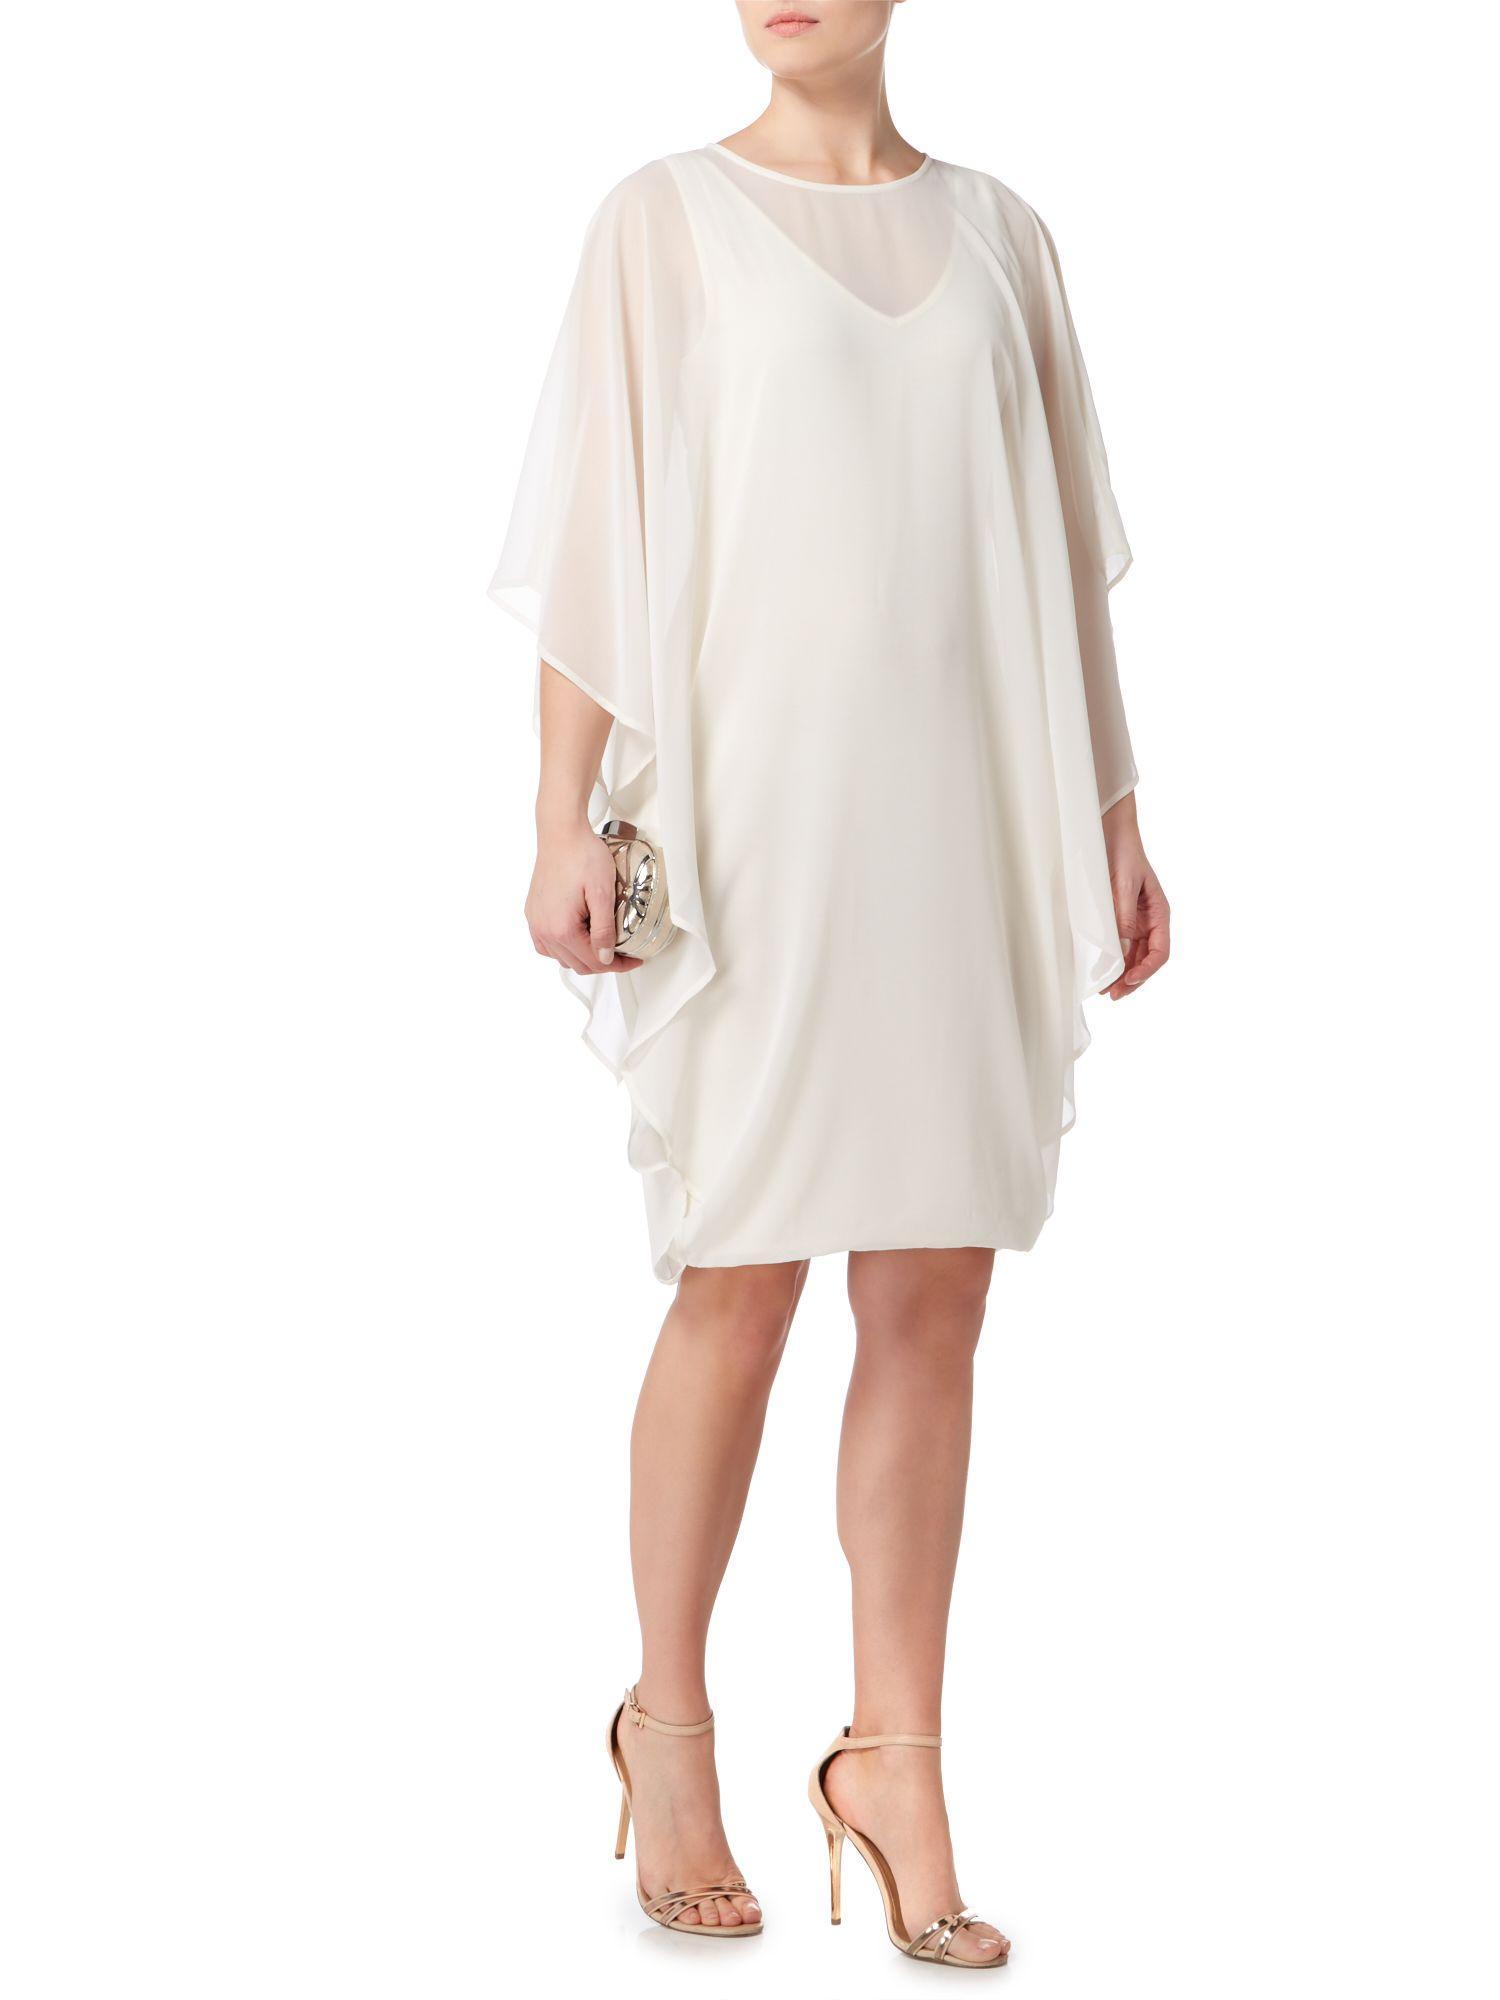 Lyst Biba Chiffon Overlay Volume Dress In White